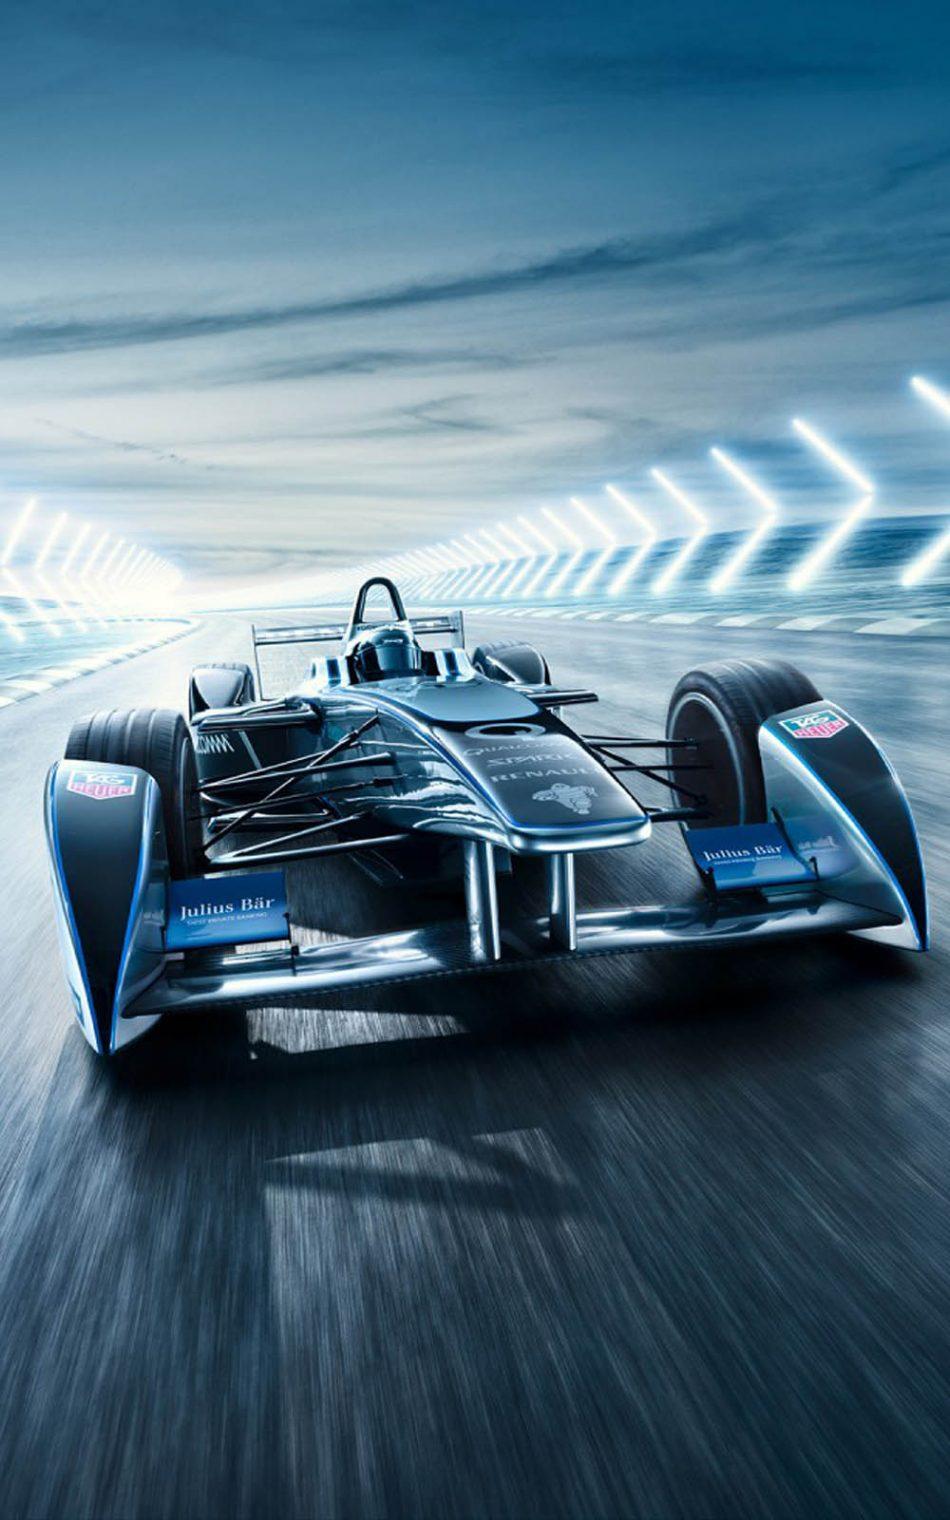 Download Renault Formula E Racing Car Free Pure 4k Ultra Hd Mobile